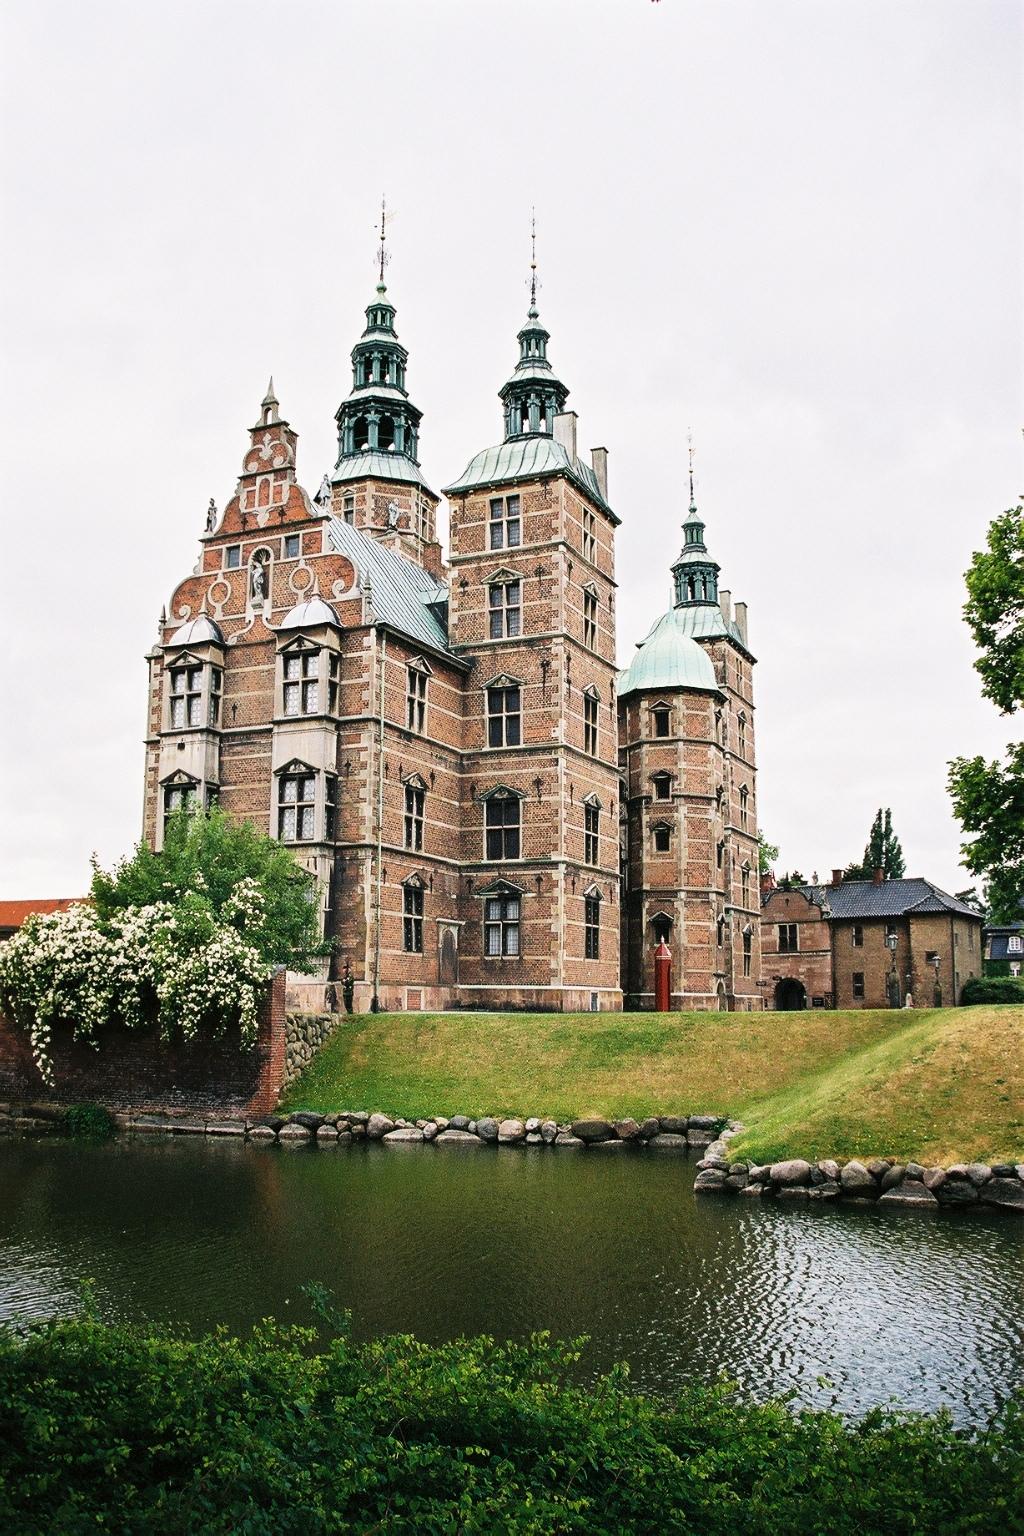 Danemark, Château de Rosenborg